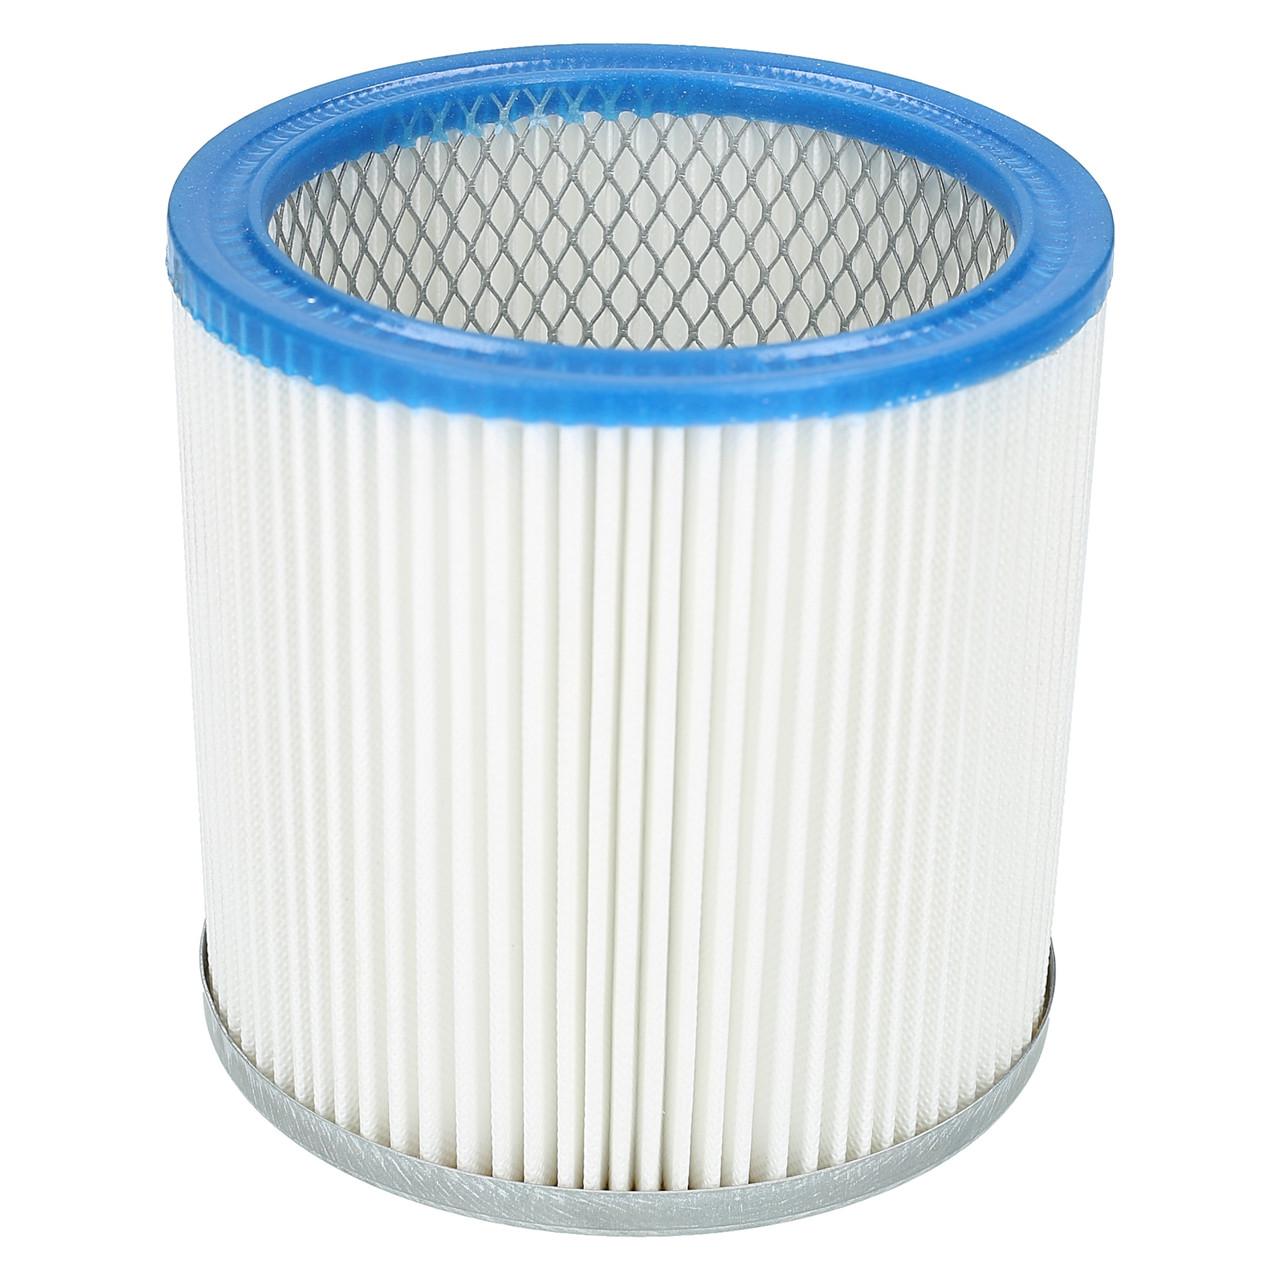 Filter passend für Aqua Vac 6310 und 6313 Aquavac Faltenfilter MADE IN GERMANY